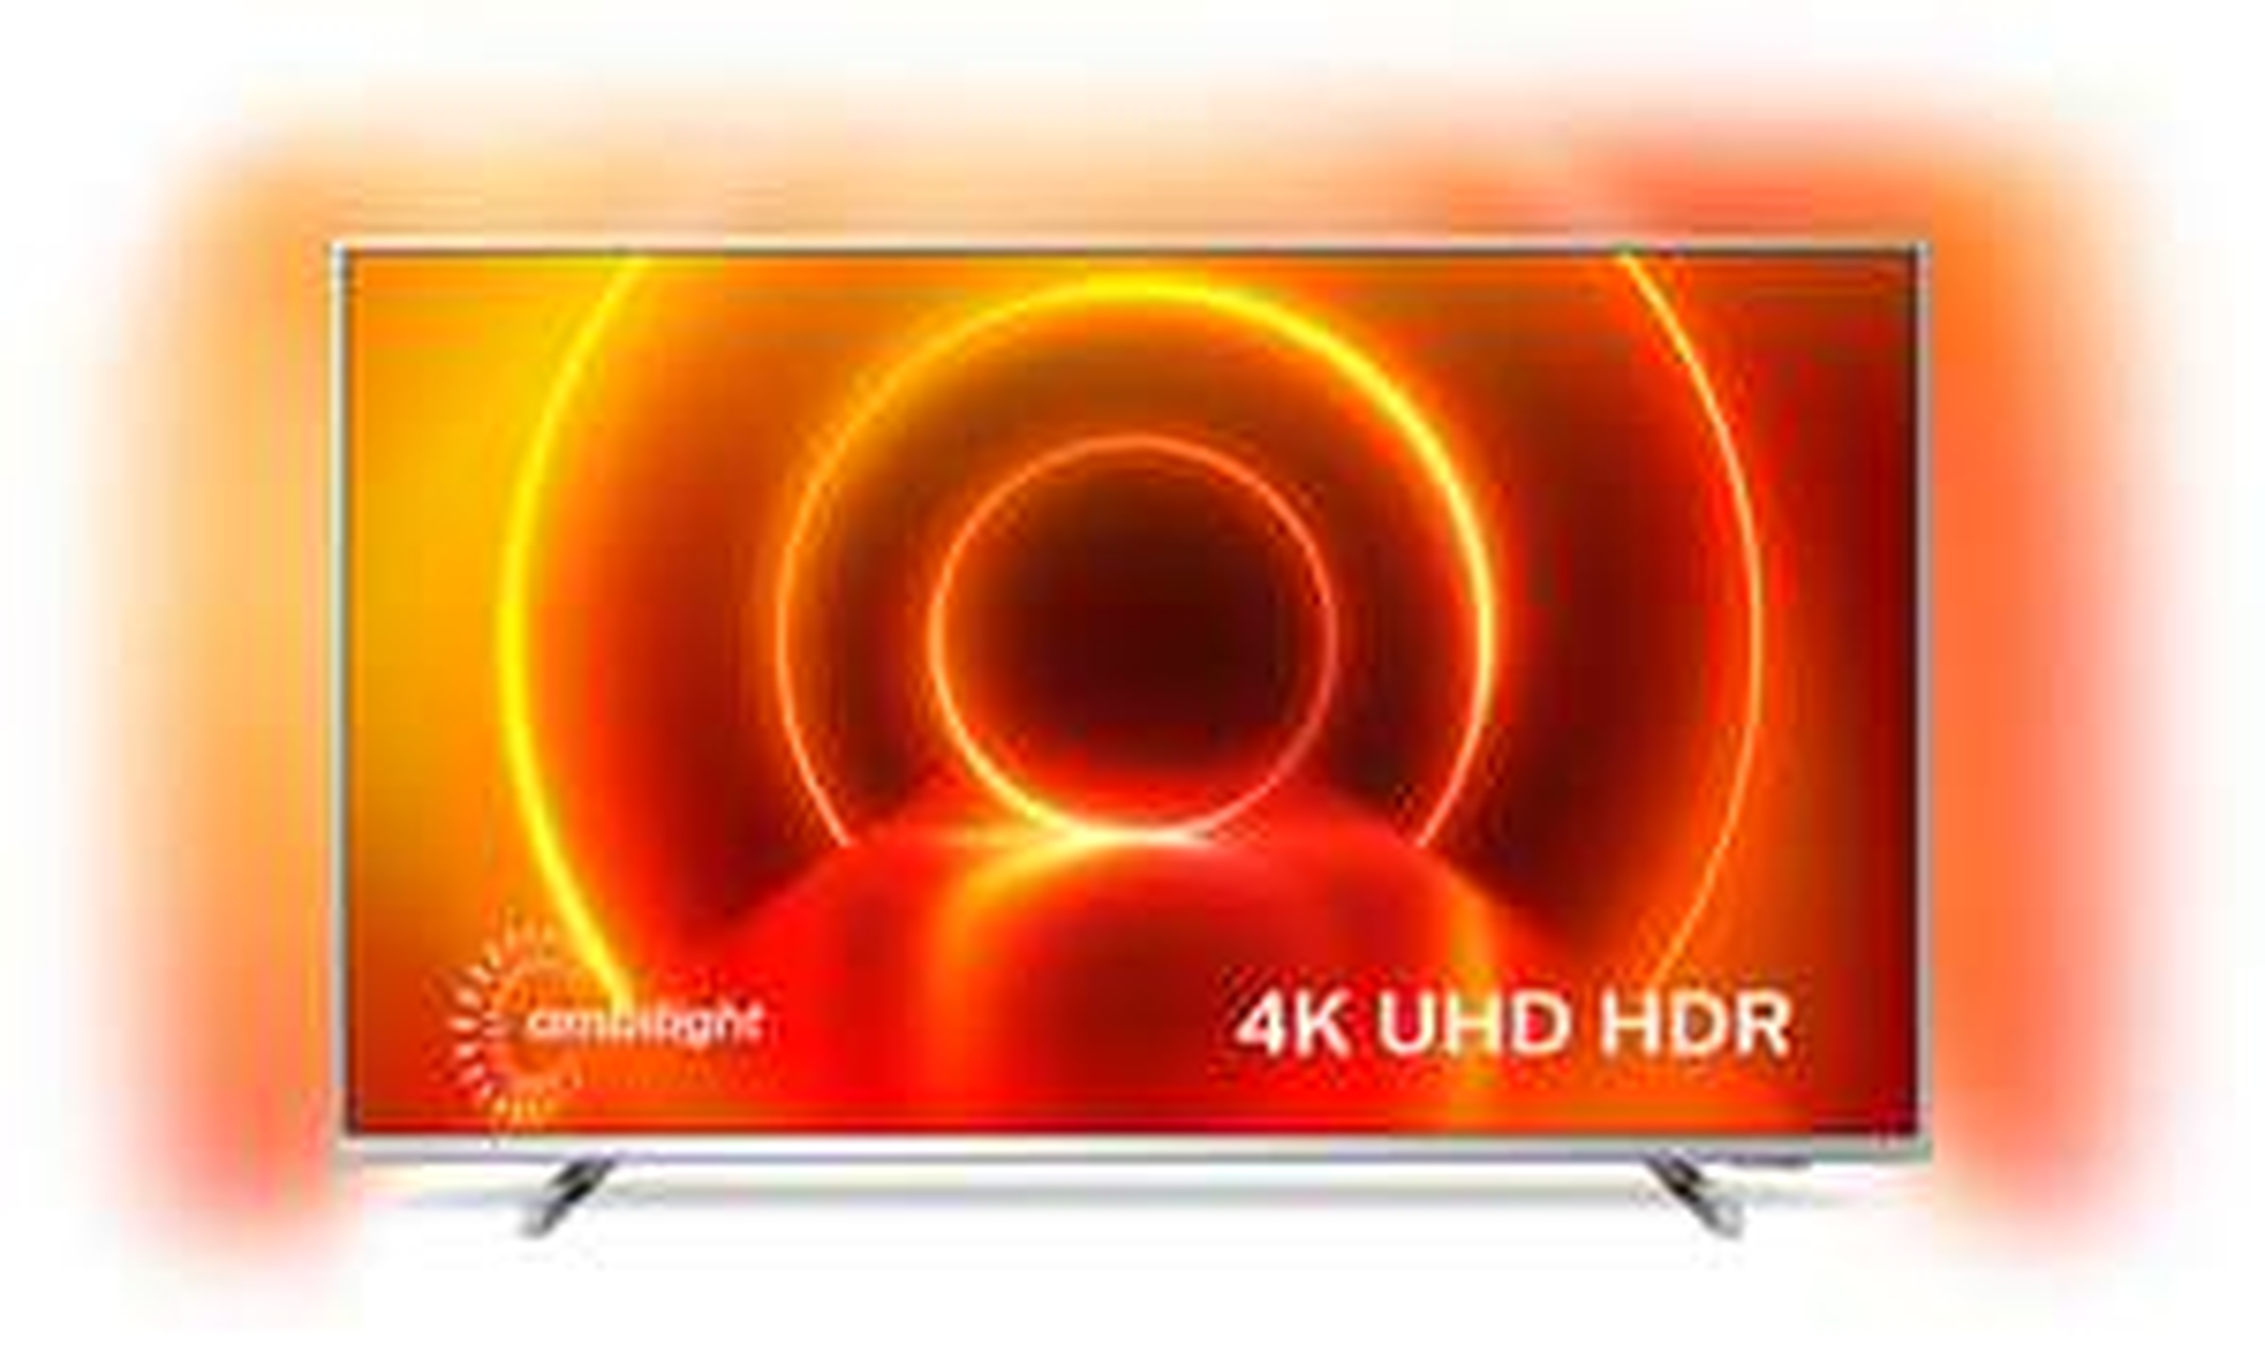 (Otto Neukunden) Philips 50PUS8105/12 LED-Fernseher (126 cm/50 Zoll, 4K Ultra HD, Smart-TV, 3-seitiges Ambilght)